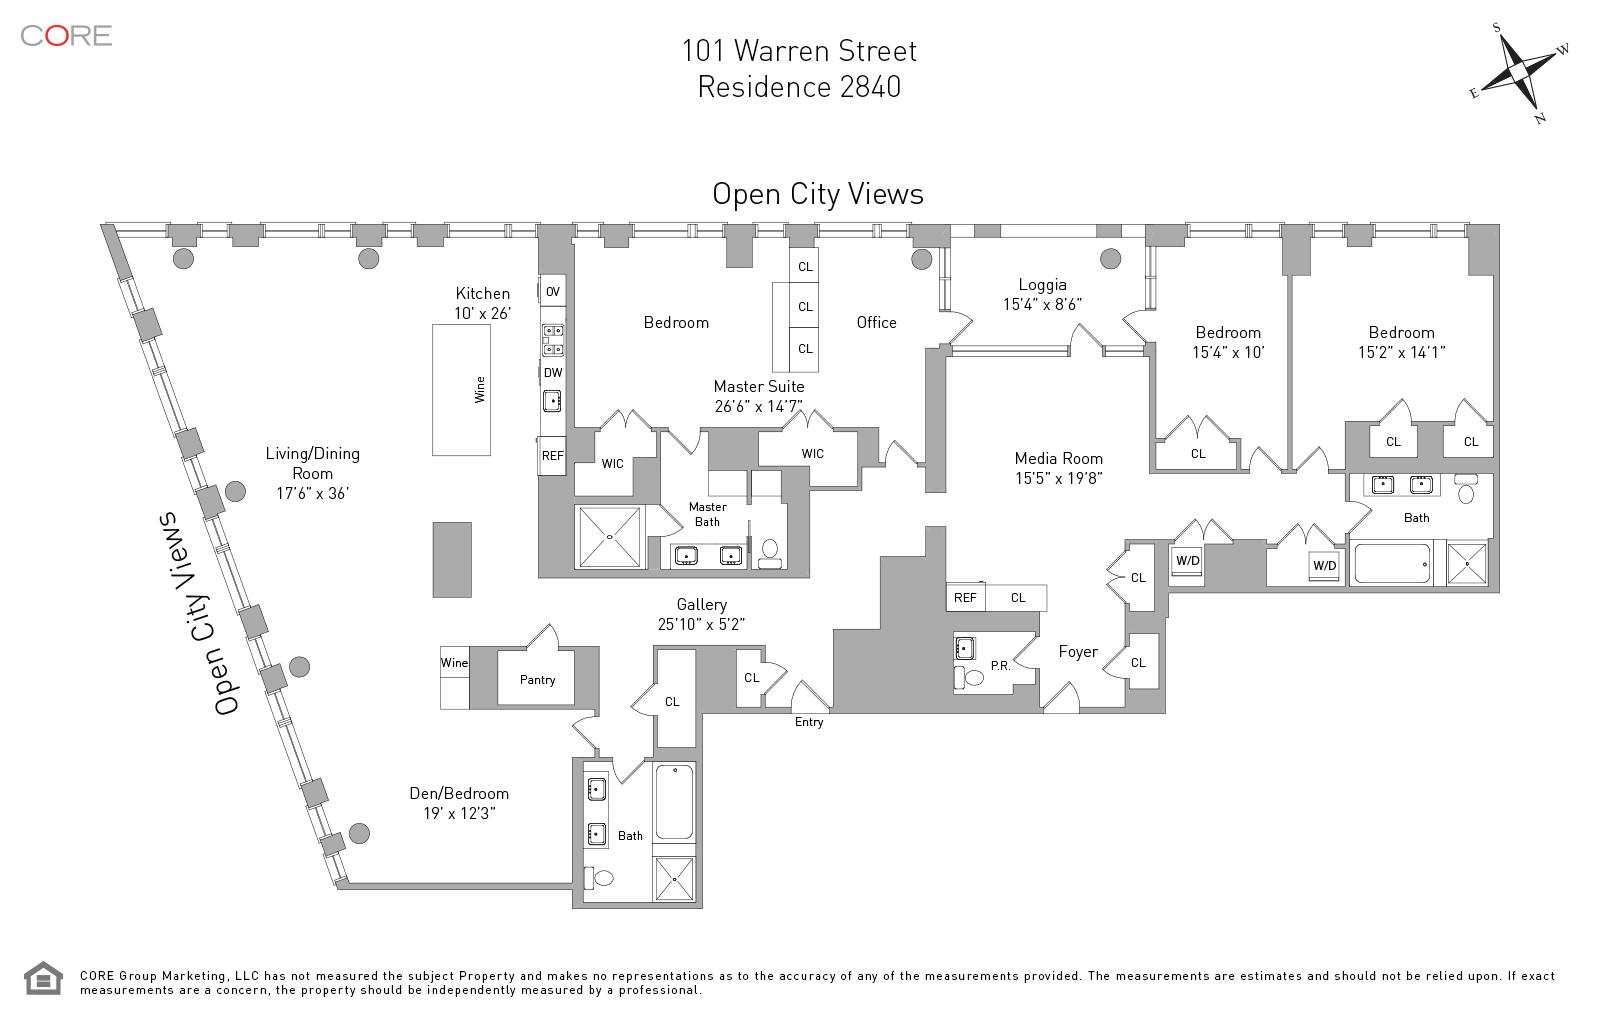 101 Warren St. 2840, New York, NY 10013